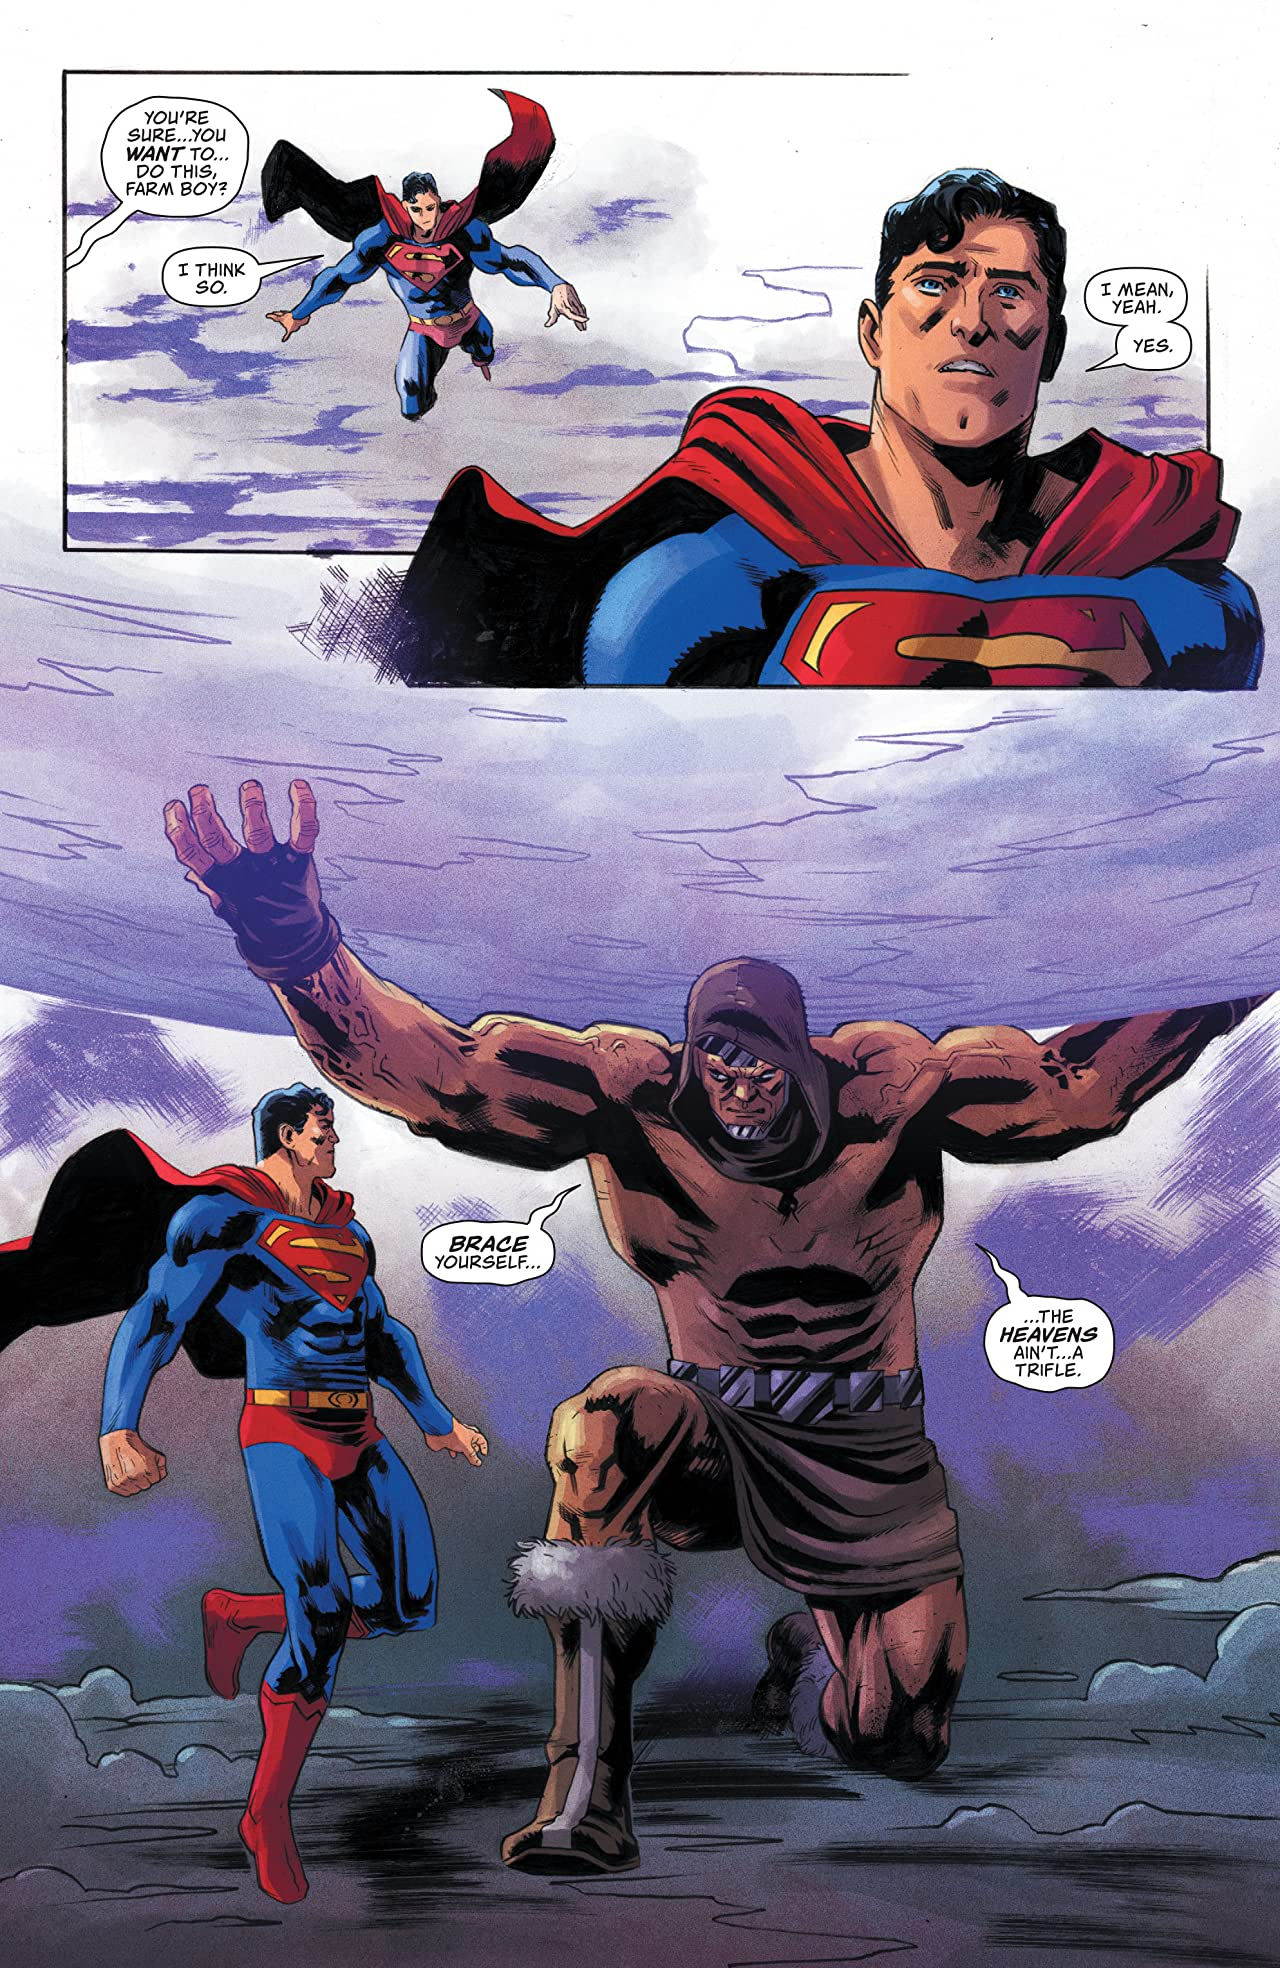 Superman: Man of Tomorrow No.12